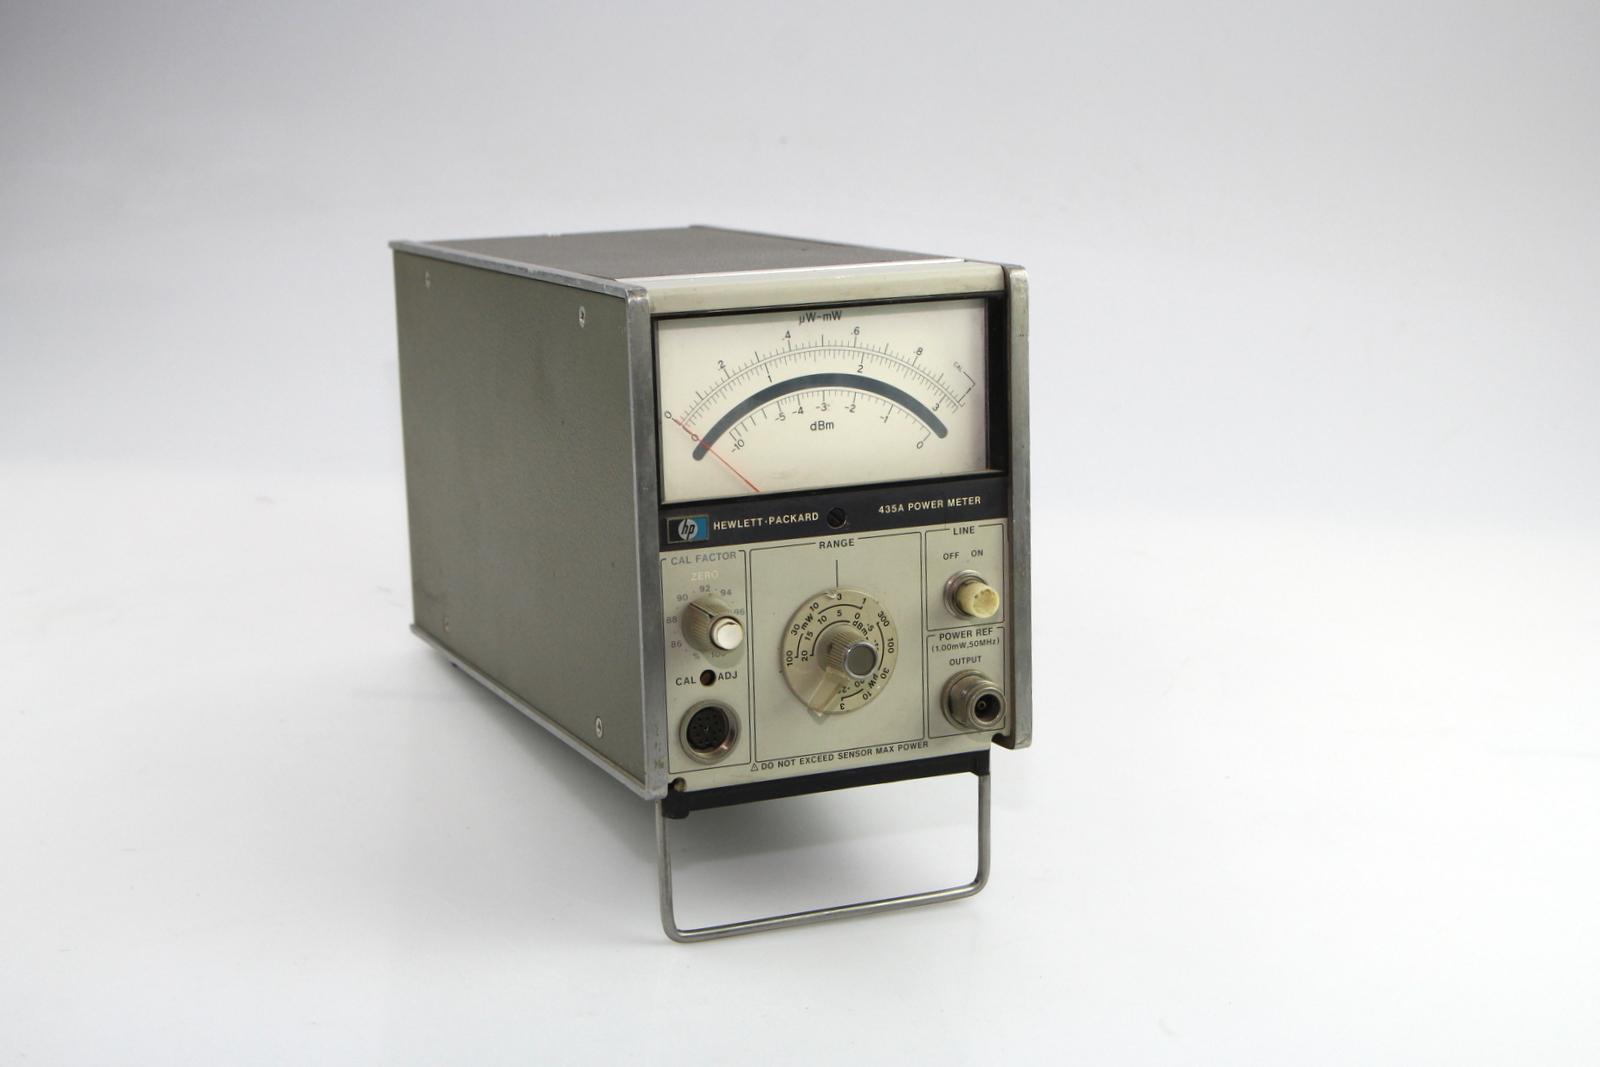 Surplus Electronic Test Equipment : Hp a rf power meter hewlett packard ebay